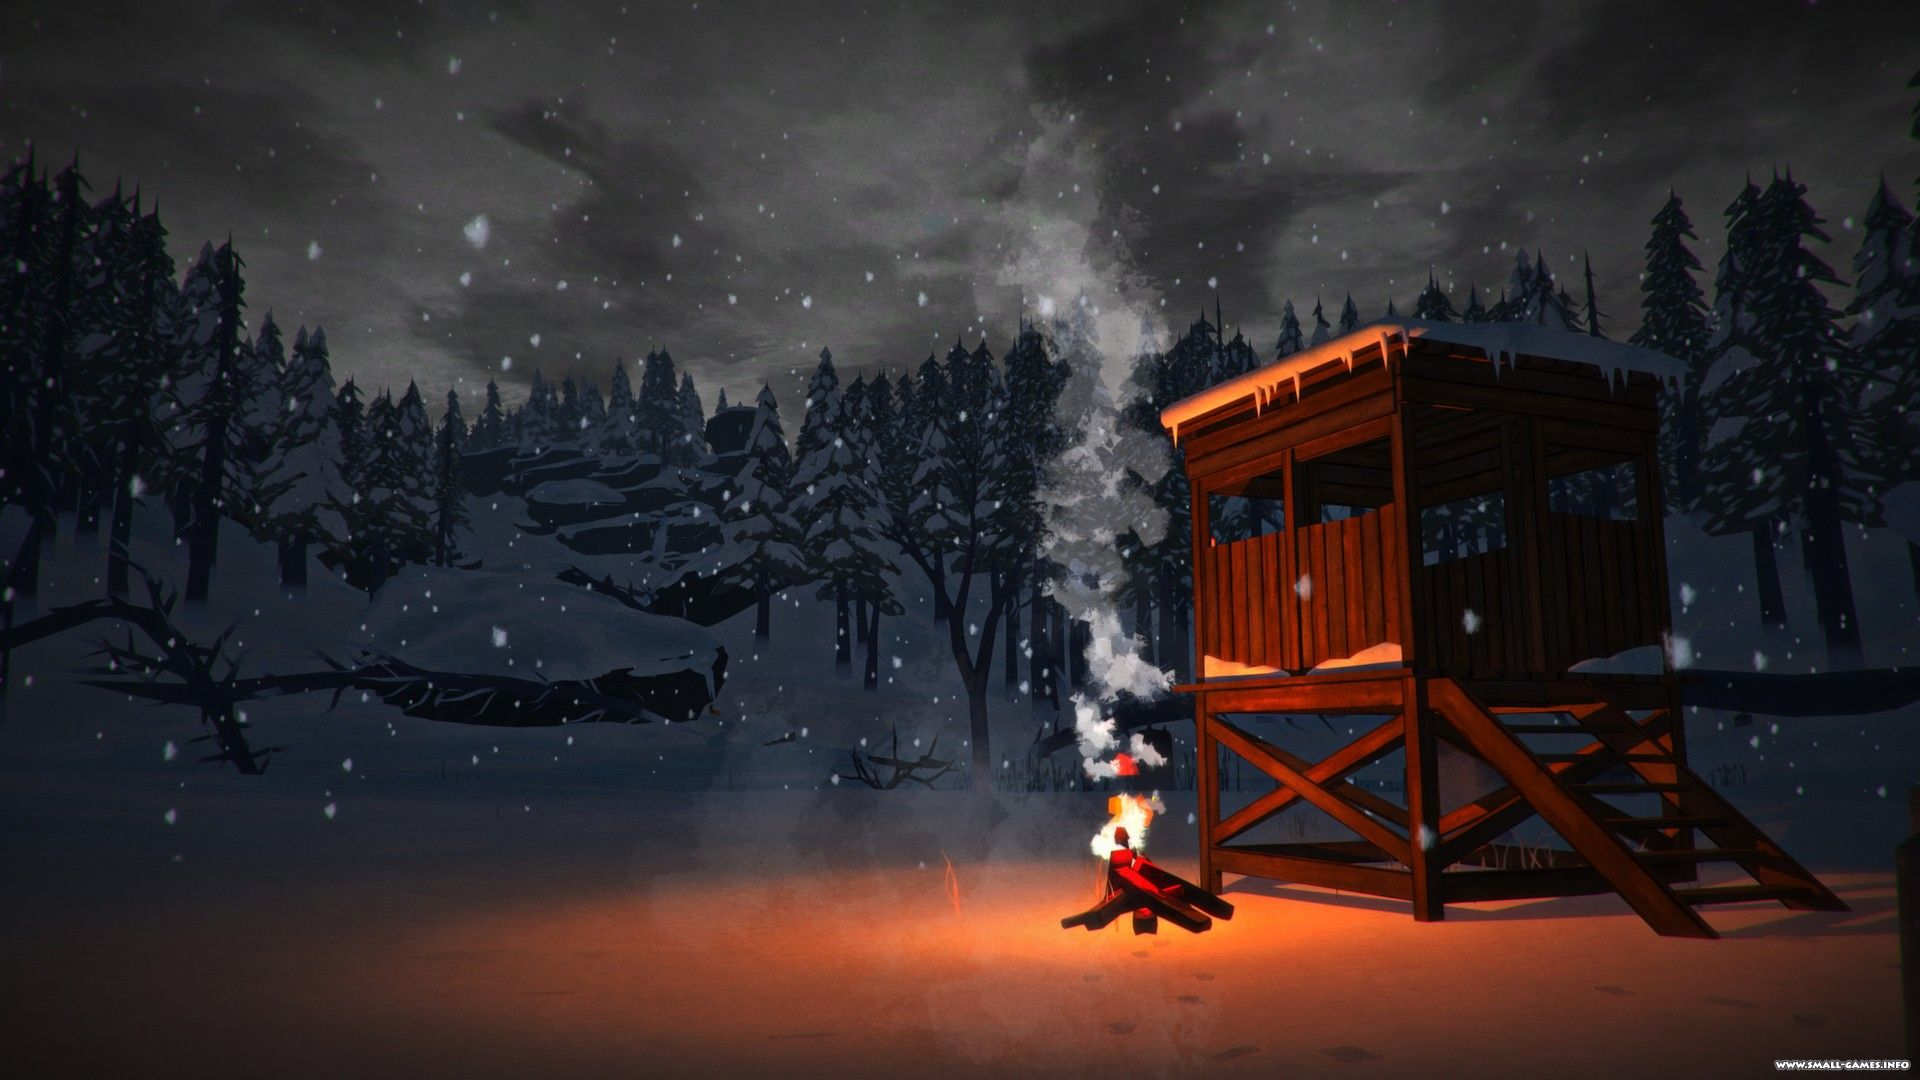 Free Download The Long Dark Outpost Wallpaper Alienware Arena